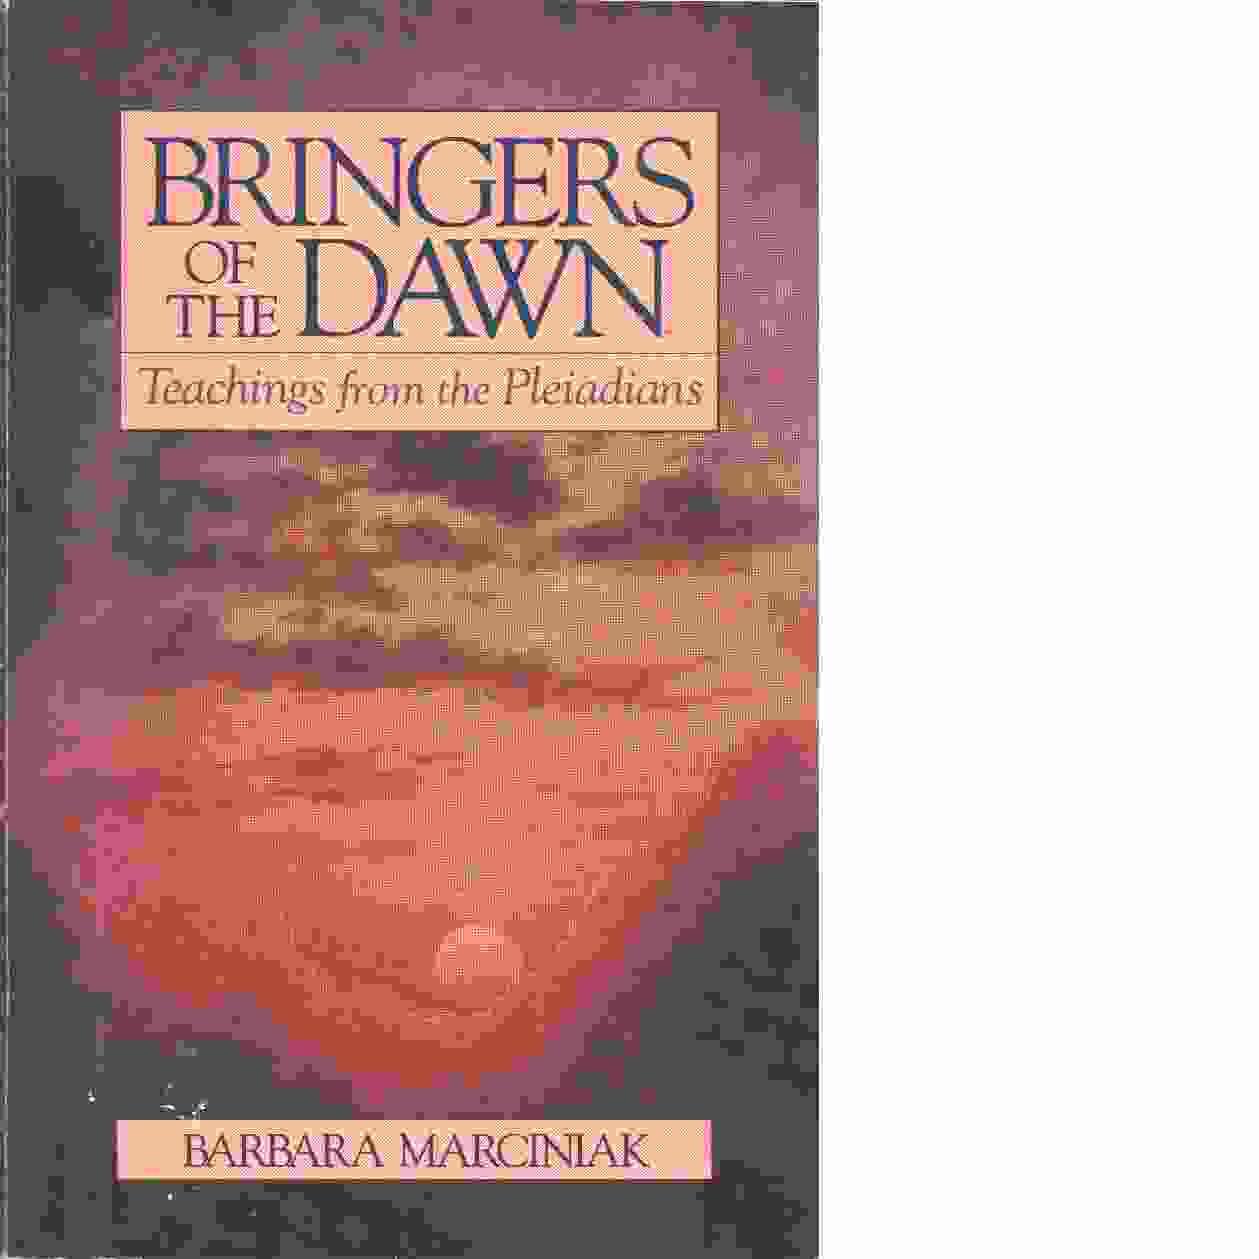 Bringers of the Dawn - Barbara Marciniak